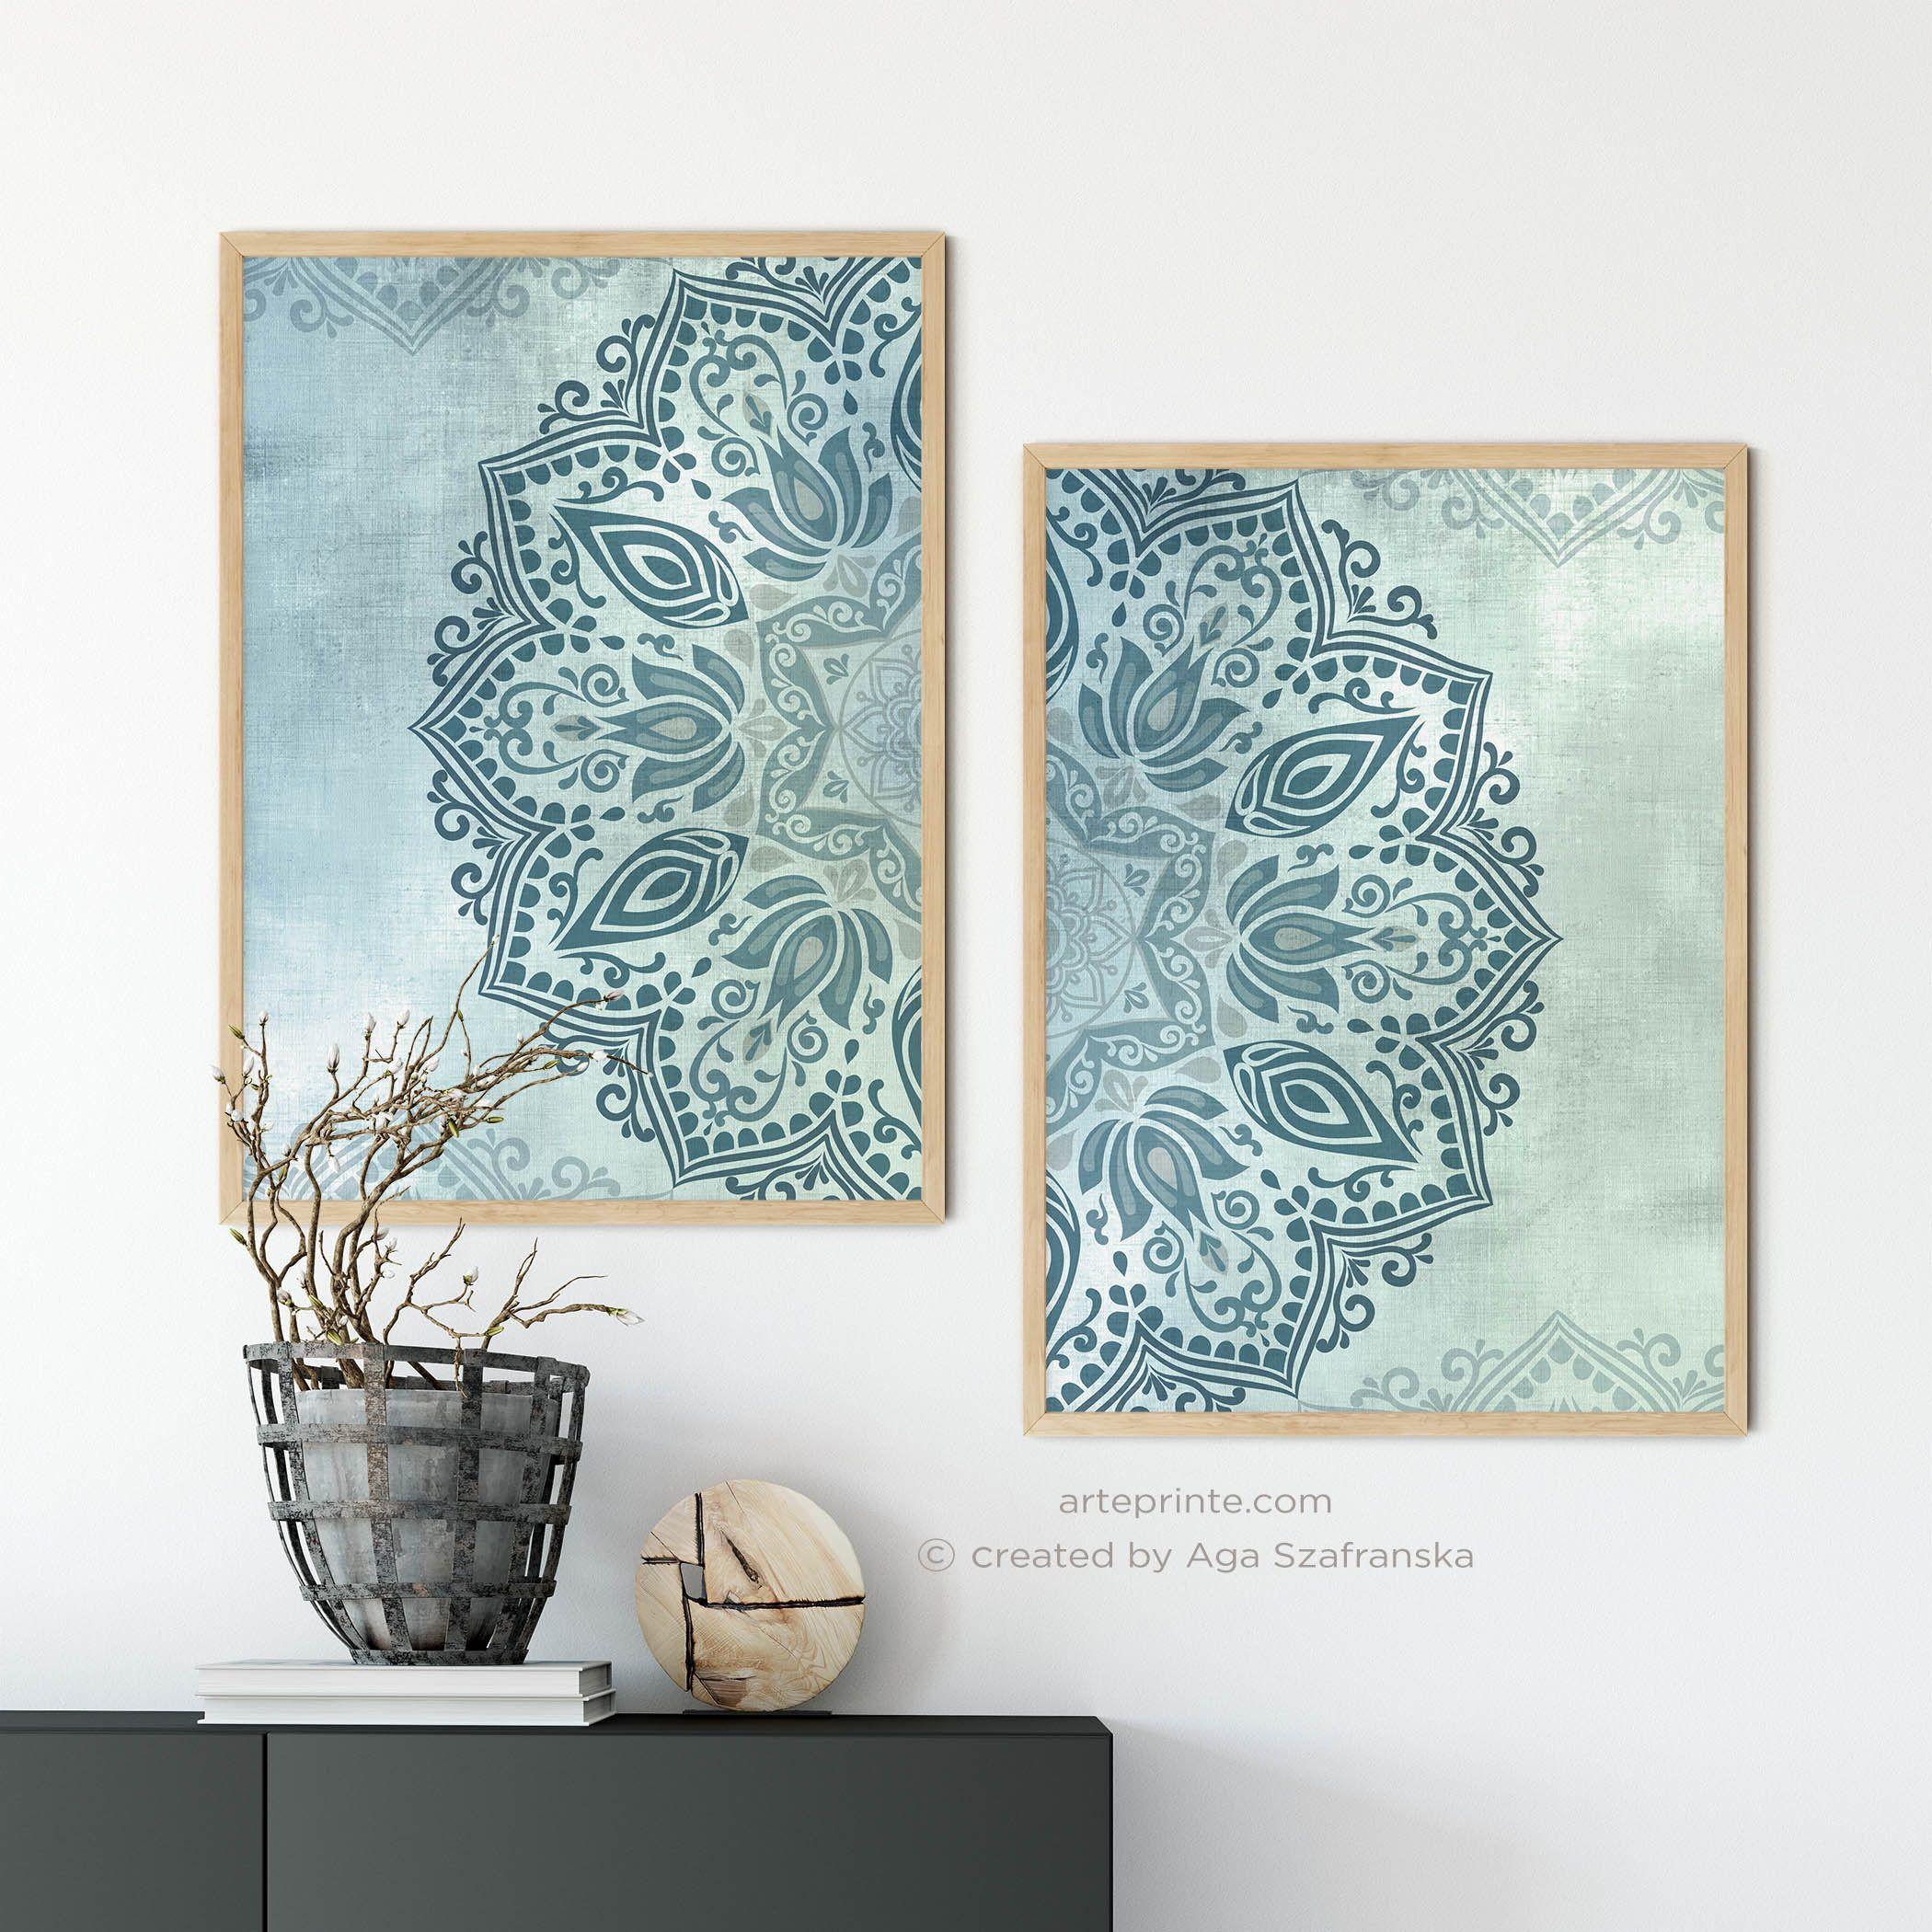 Mandala Wall Art Set Of 2 Downloadable Prints Boho Wall Decor Etsy In 2020 Mandala Wall Art Wall Art Sets Printable Wall Art